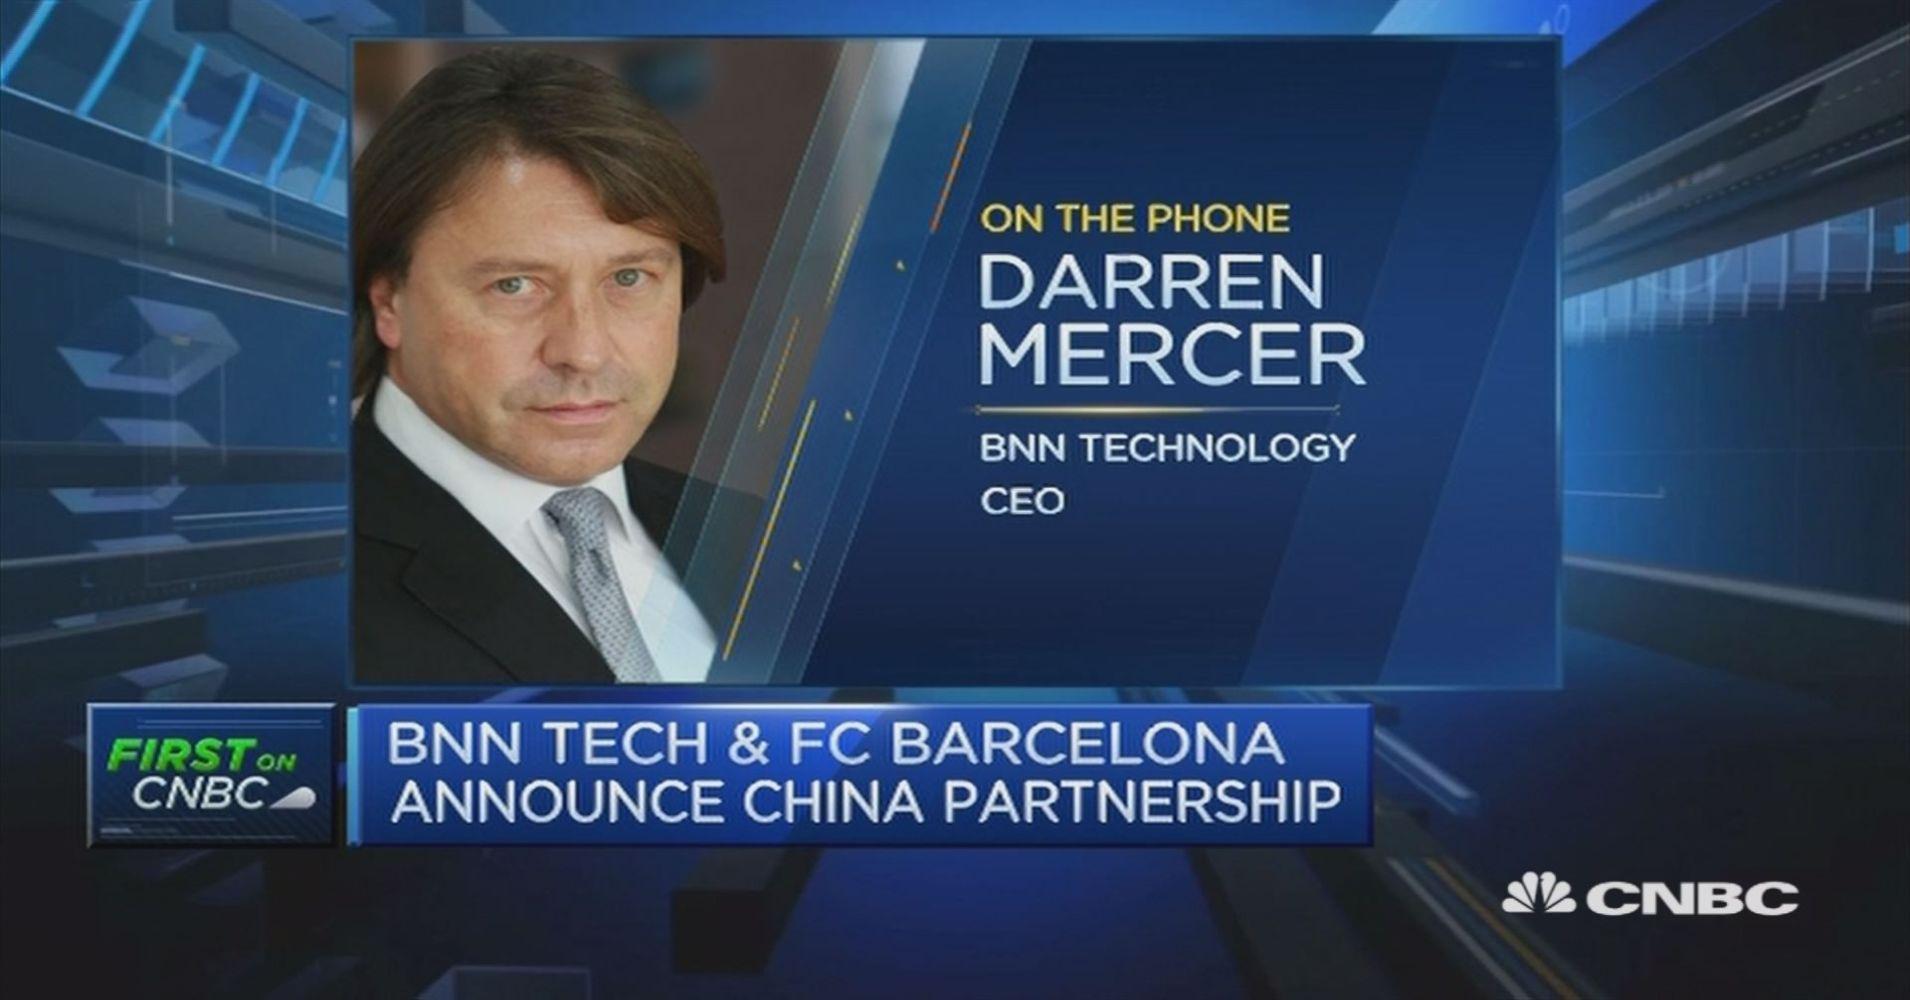 CNBC DarrenMercer.jpg